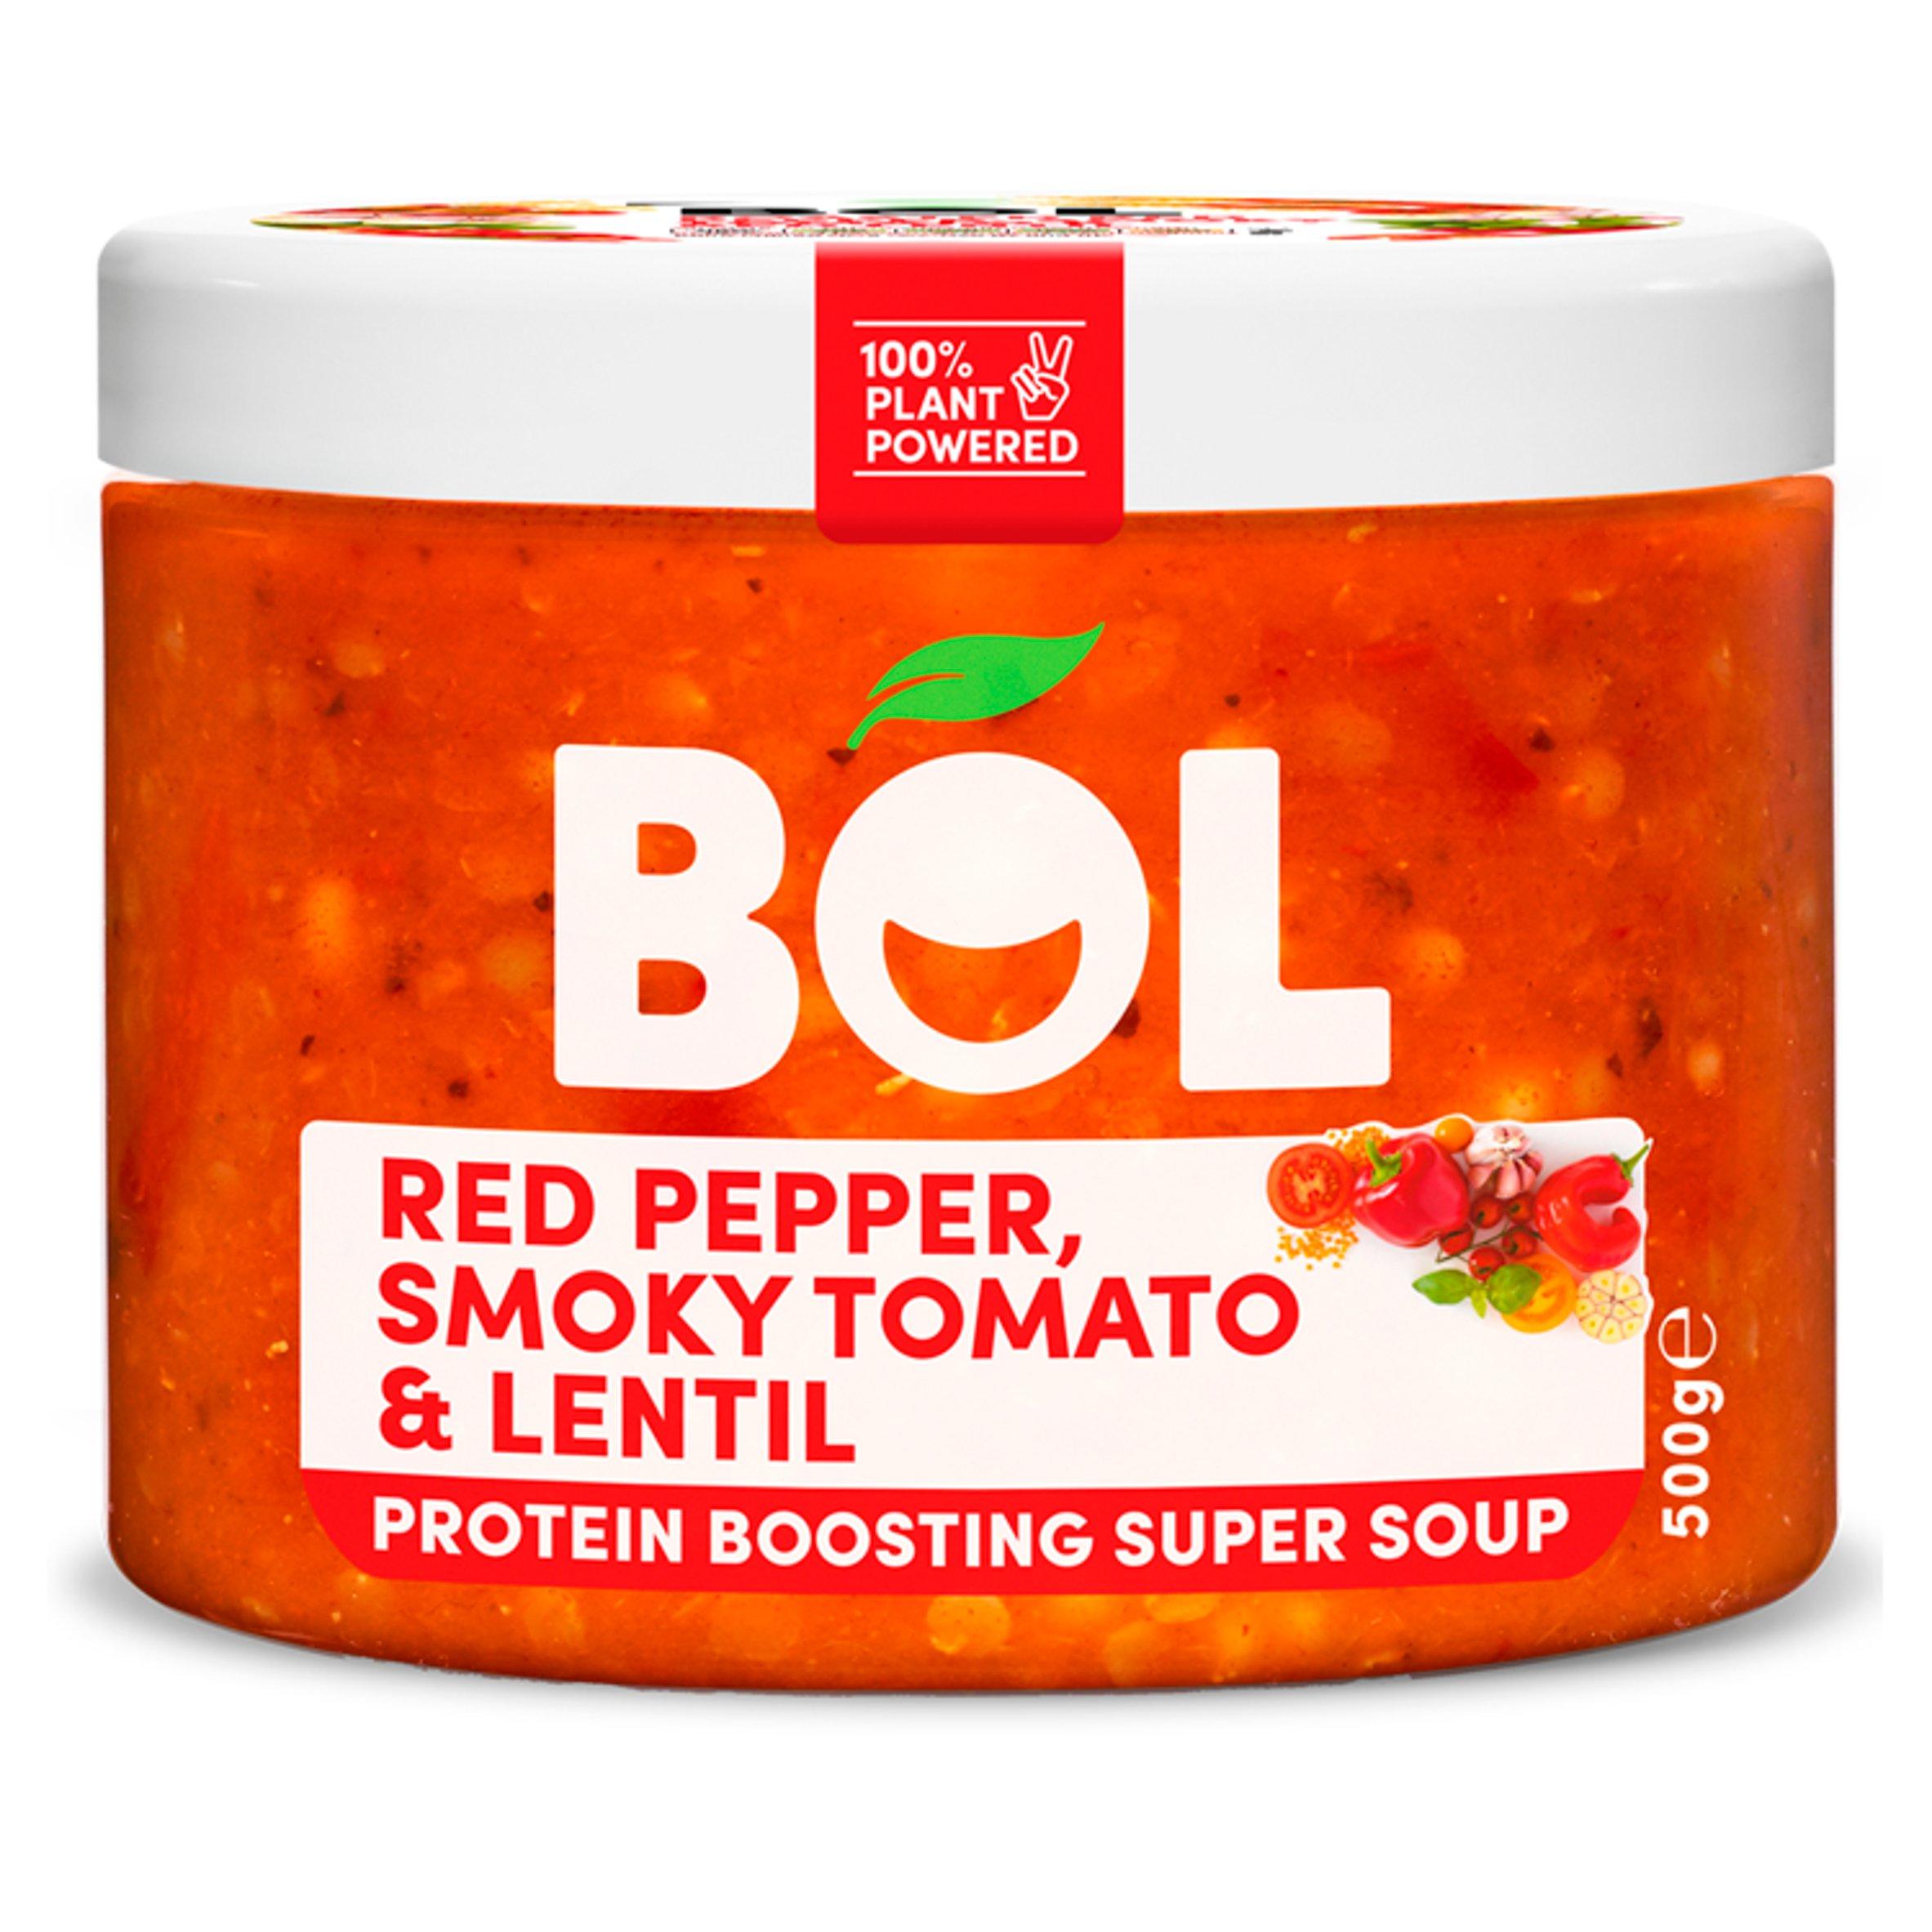 Bol Smokey Tomato Lentil Protein Boosting Super Soup 500G